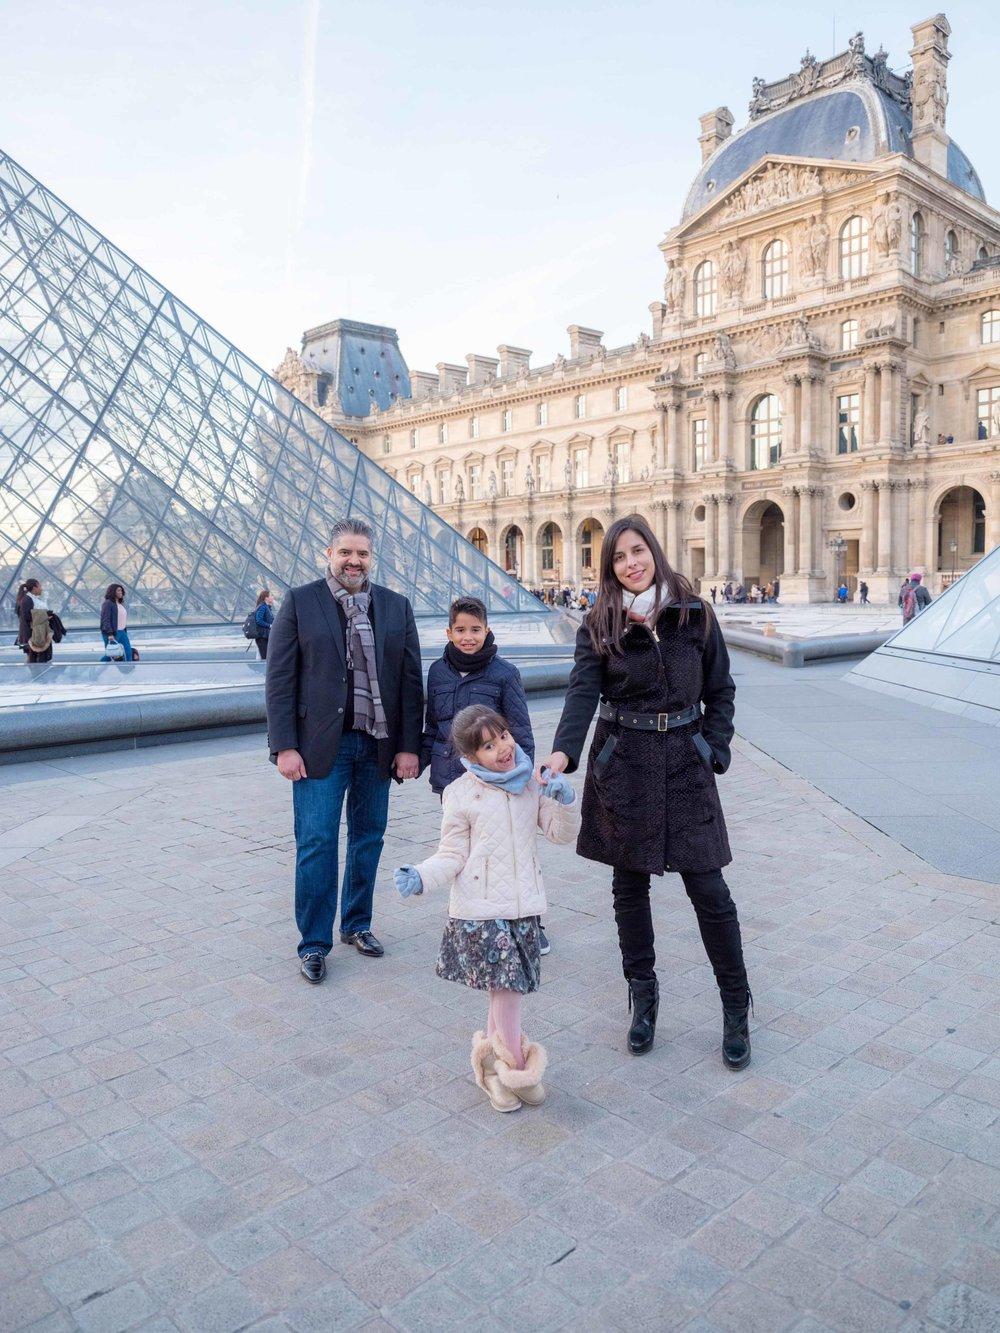 family in pqris in autumn at louvre museum